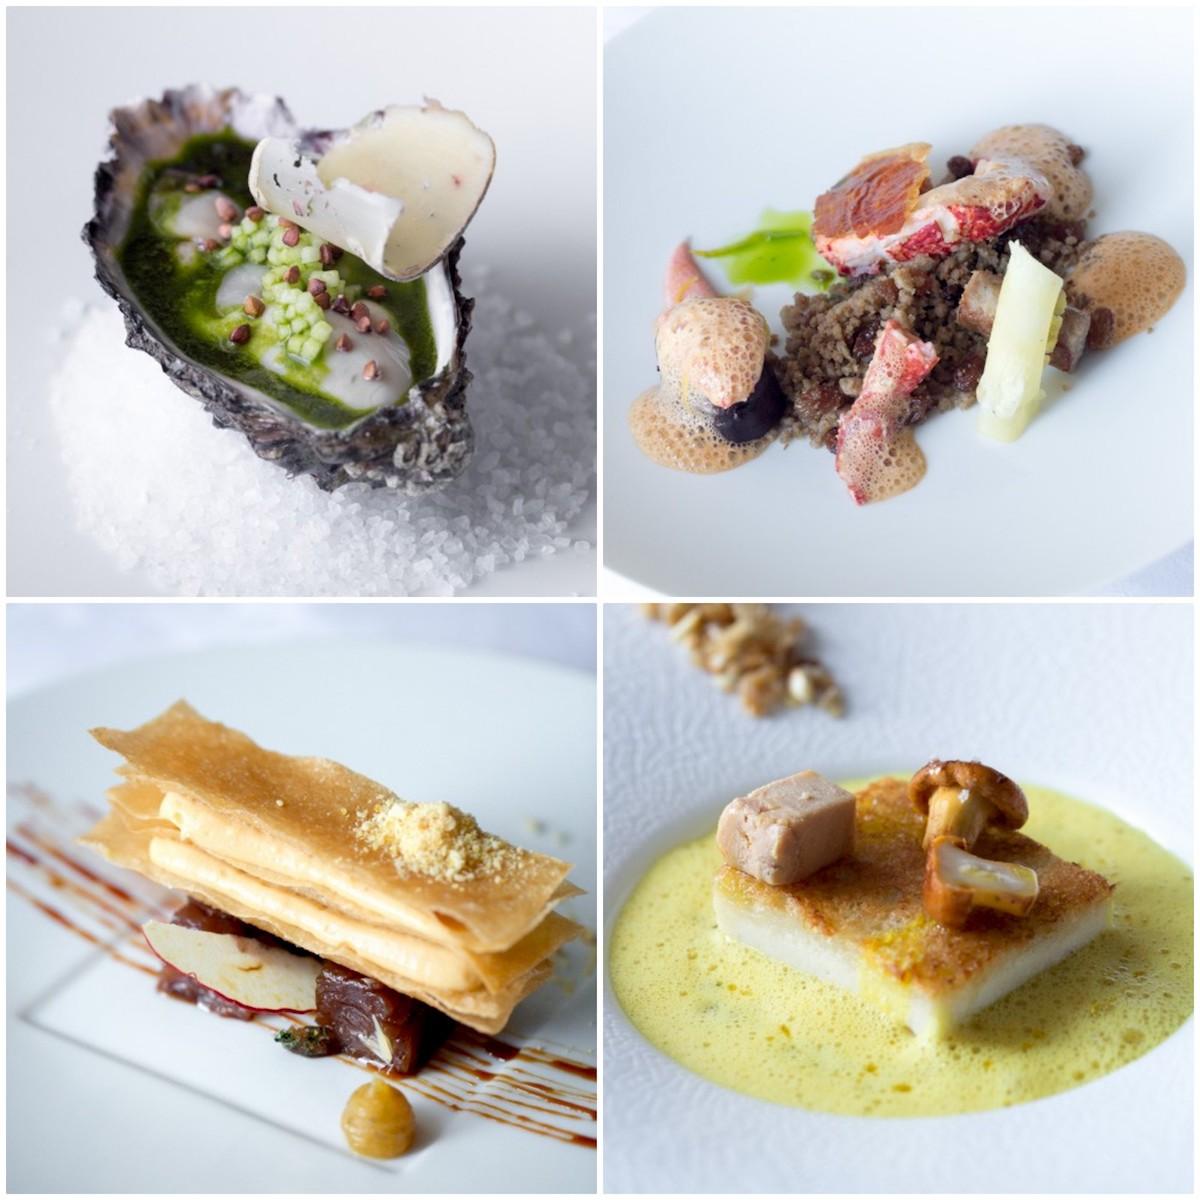 La cuisine d'Olivier Bellin